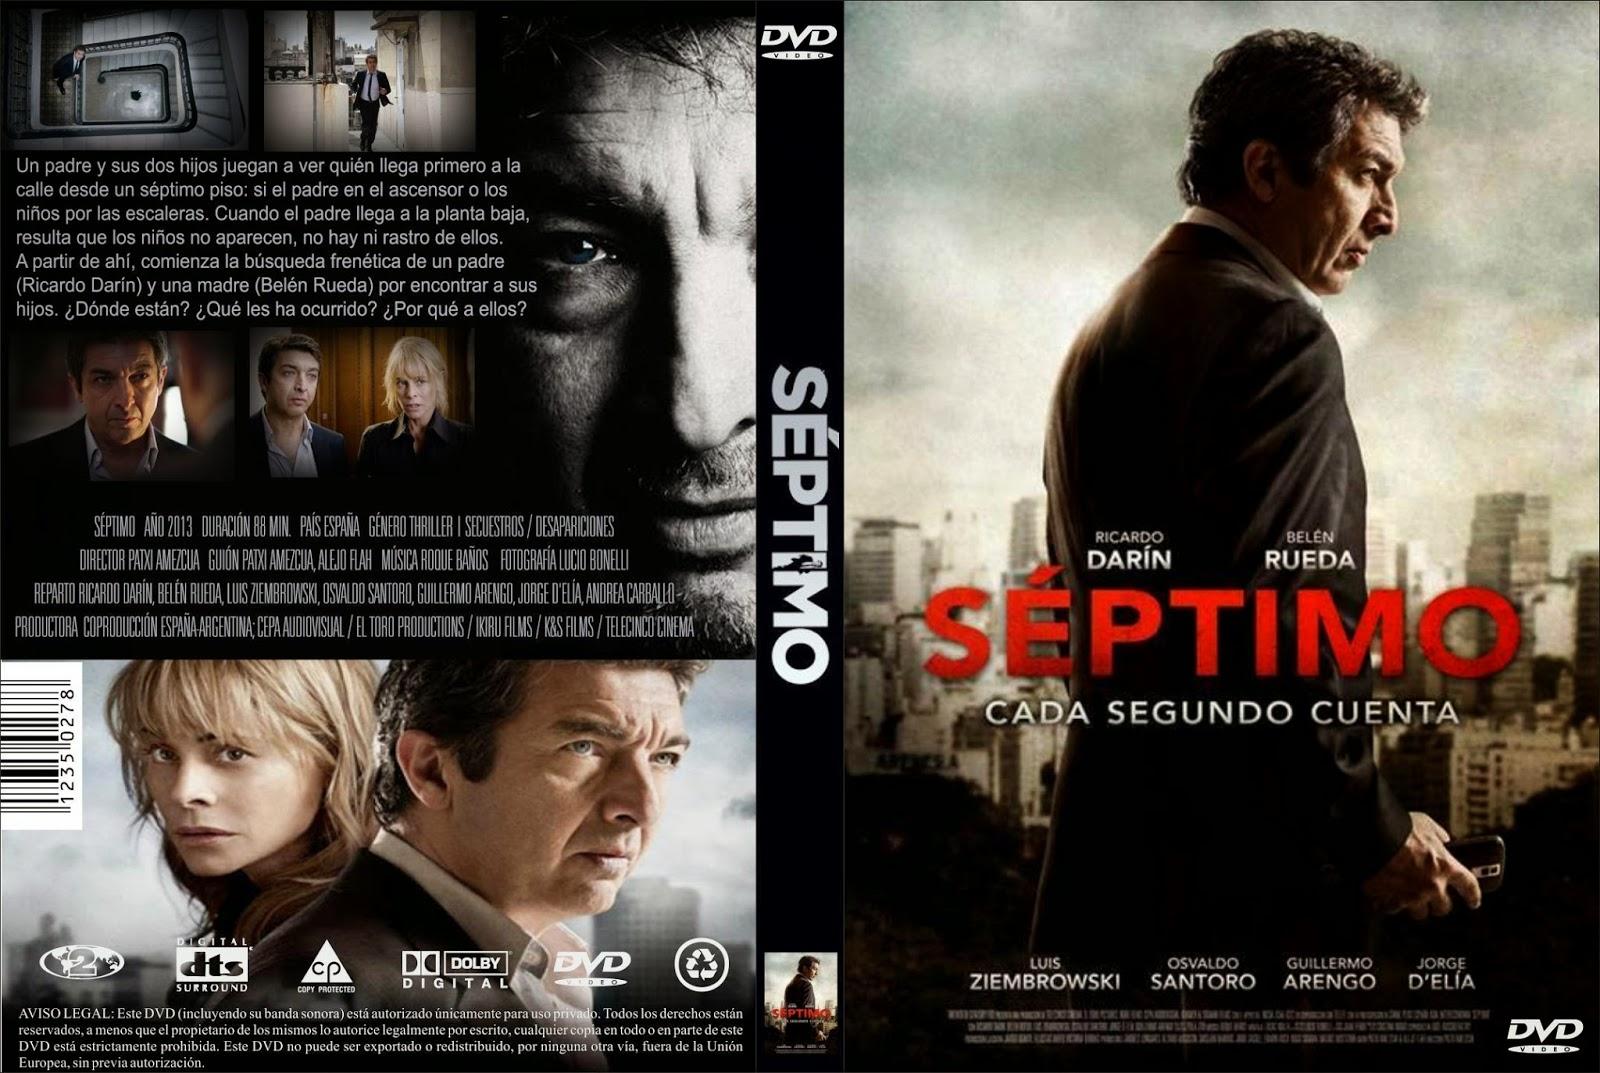 Download Sétimo BDRip XviD Dual Áudio Septimo   Custom por jonander1  5Bdvd 5D 80